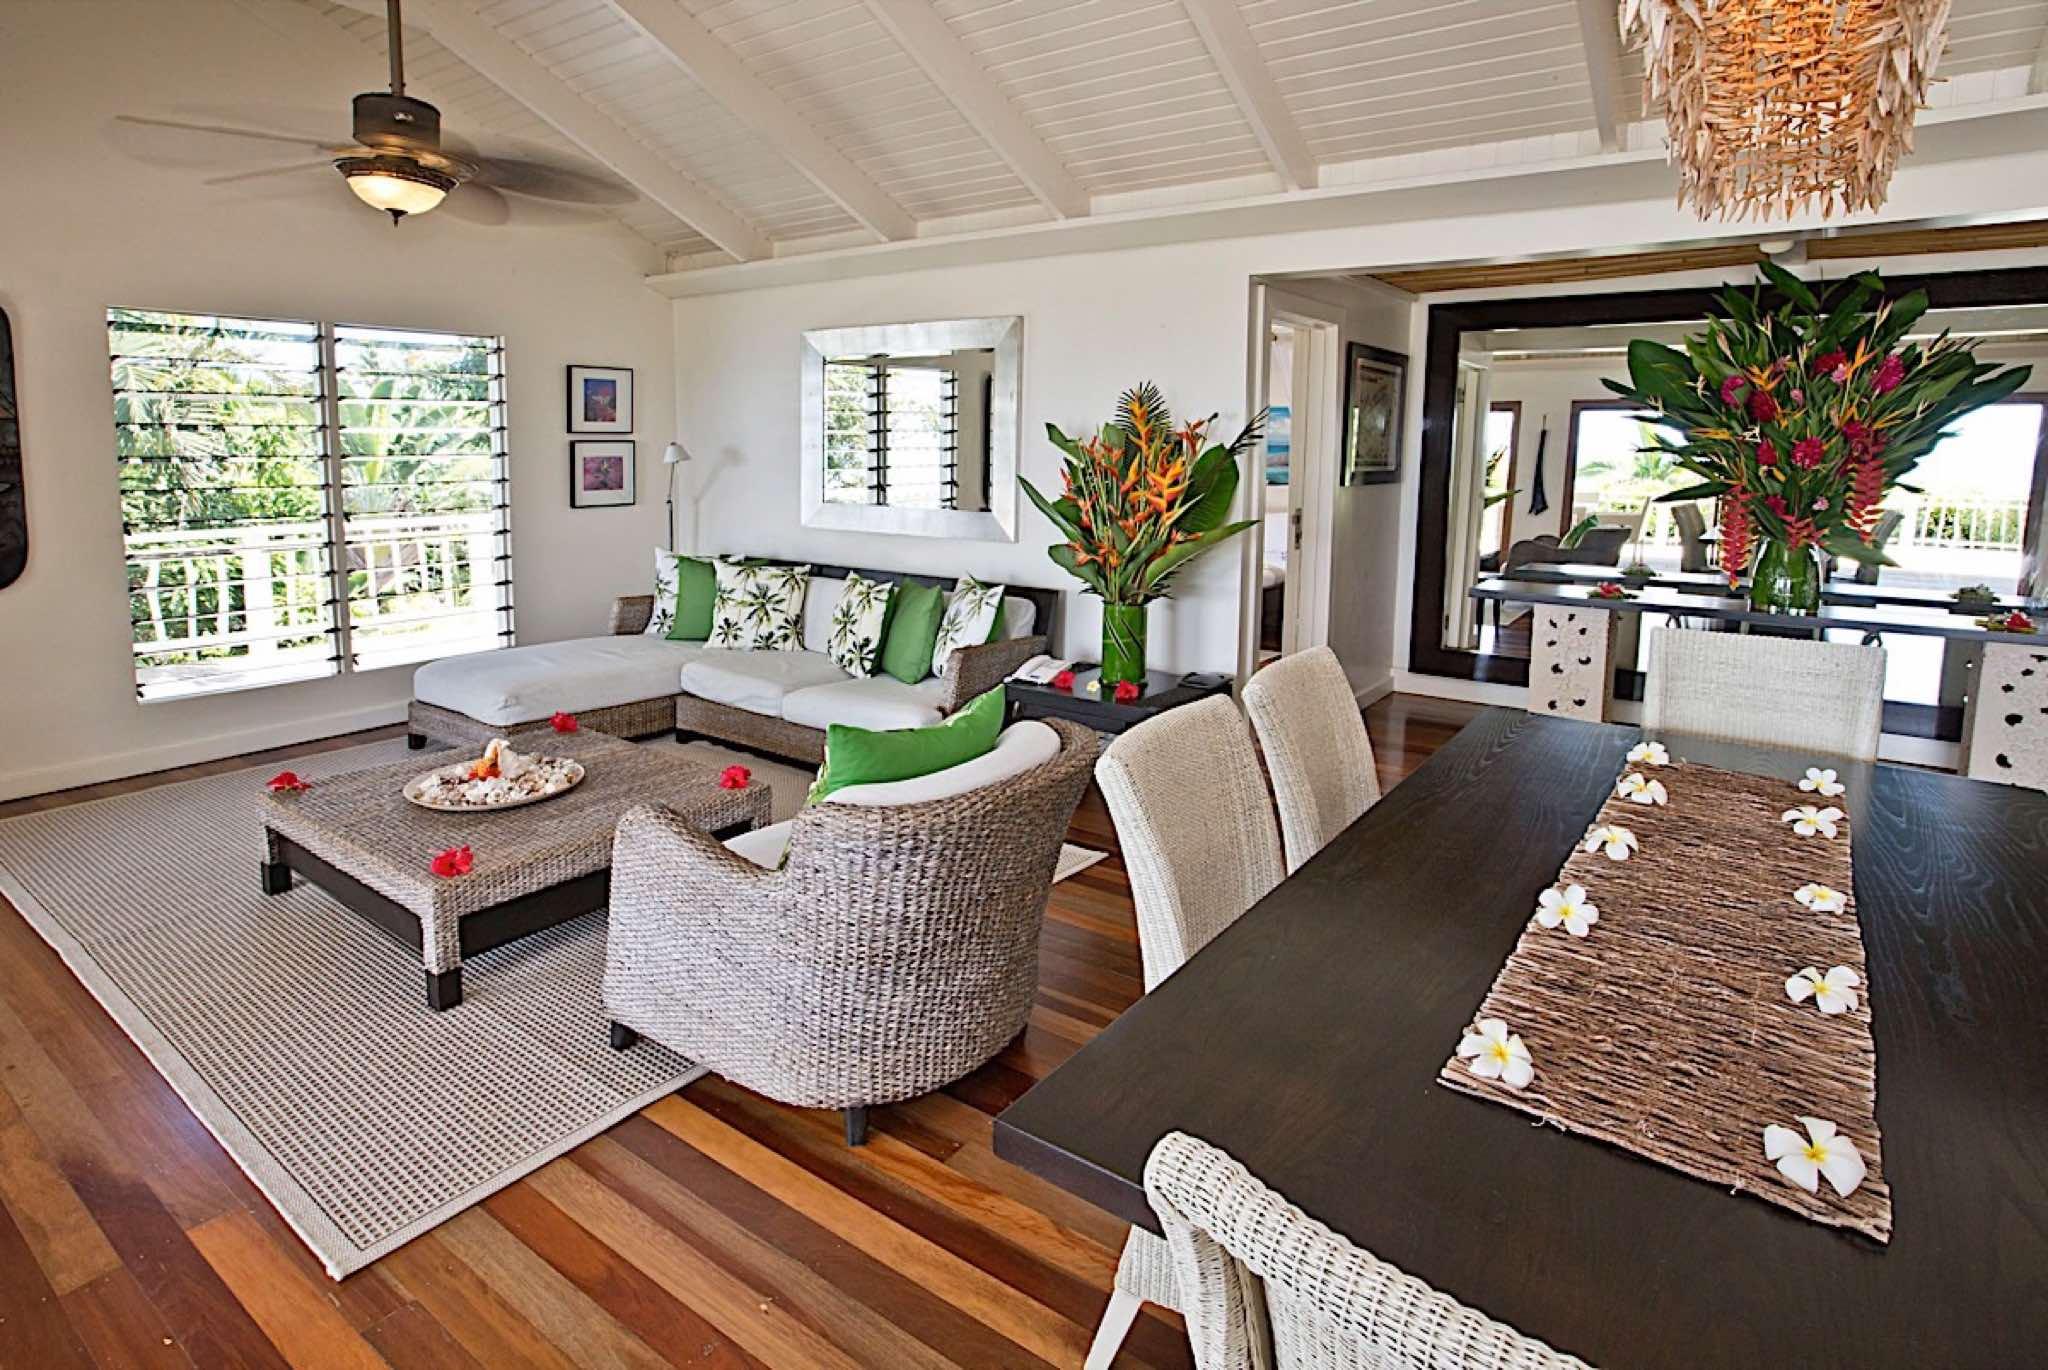 Taveuni Palms Resort, Fiji - Honeymoon holiday destinations